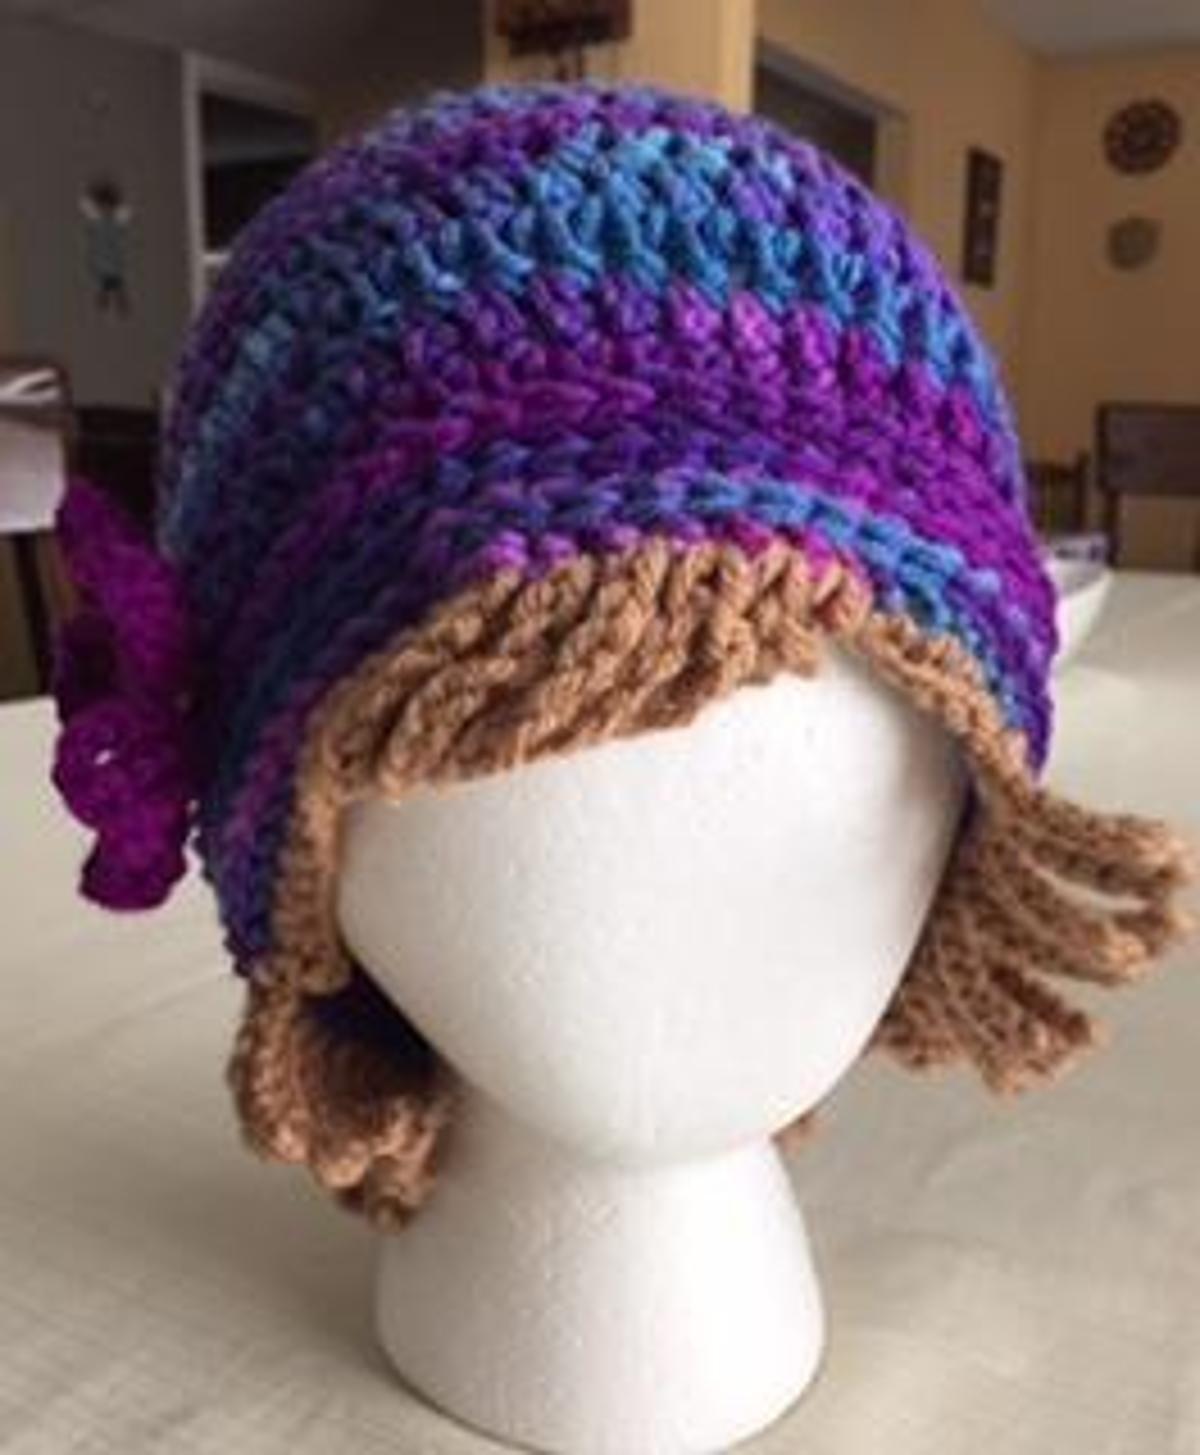 Chemo Hat Crochet PATTERN | Craftsy | Crotchet hats | Pinterest ...